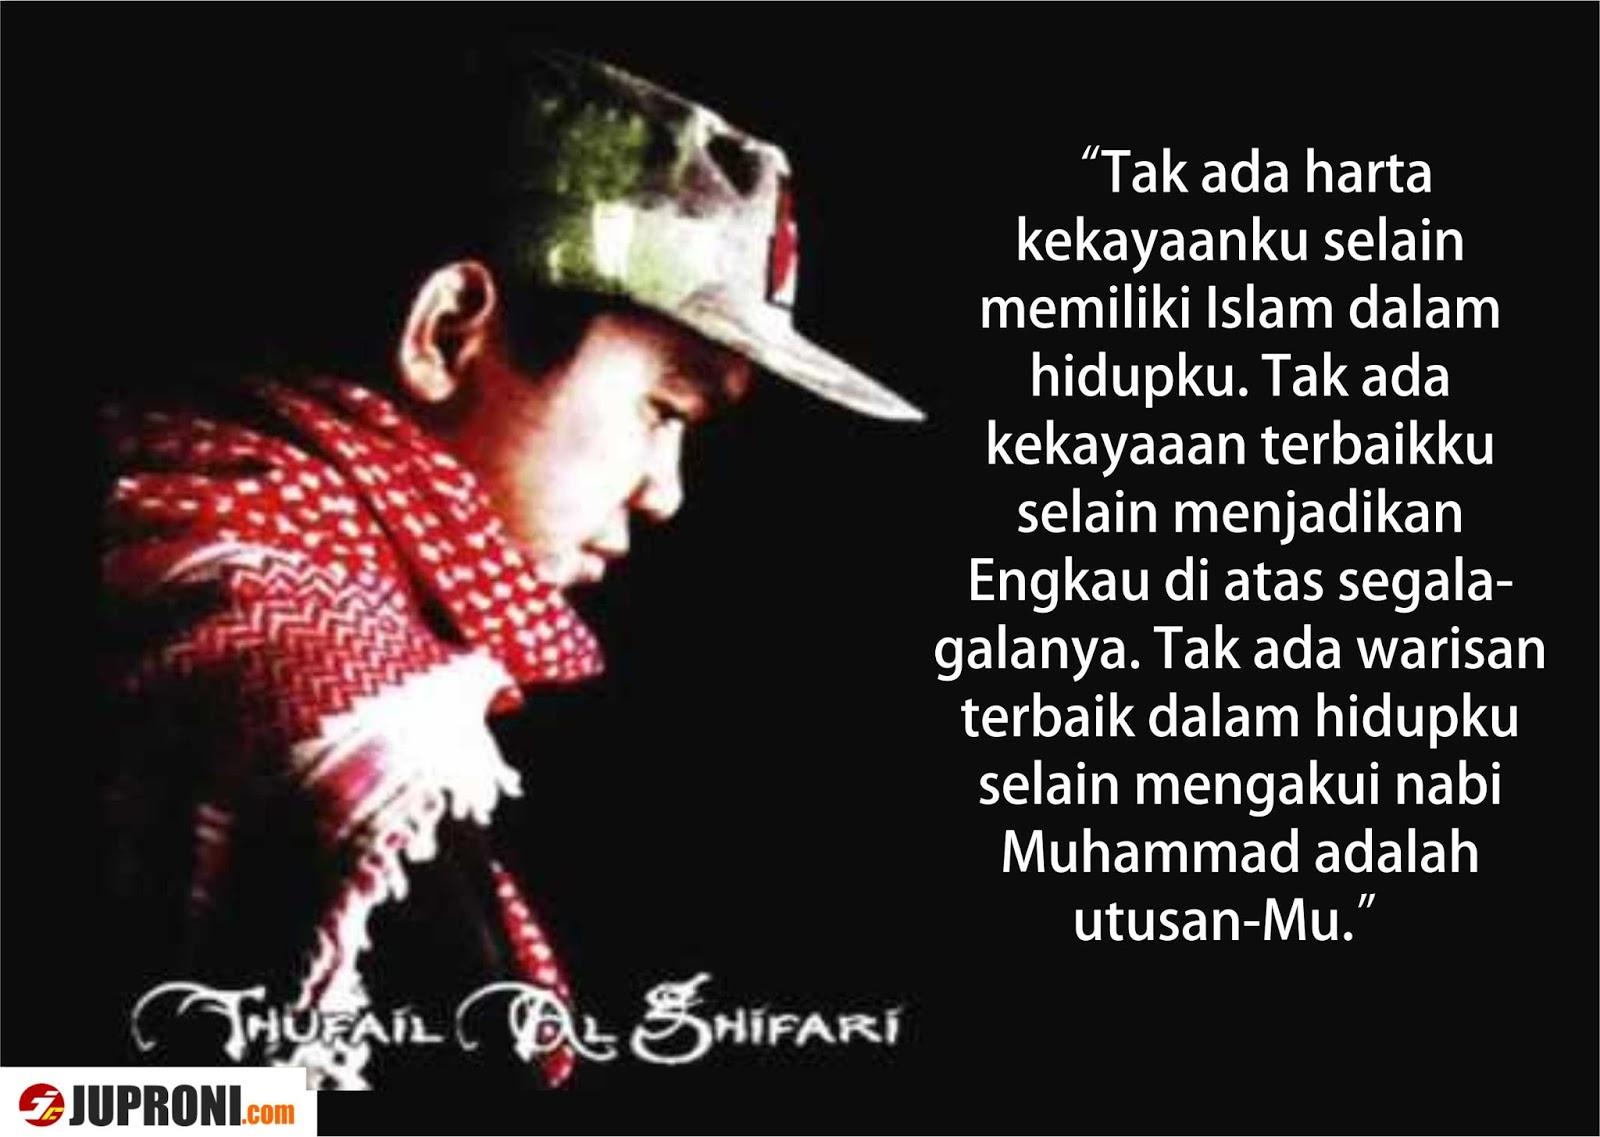 Kata Kata Mutiara Thufail Al Ghifari Juproni Quotes